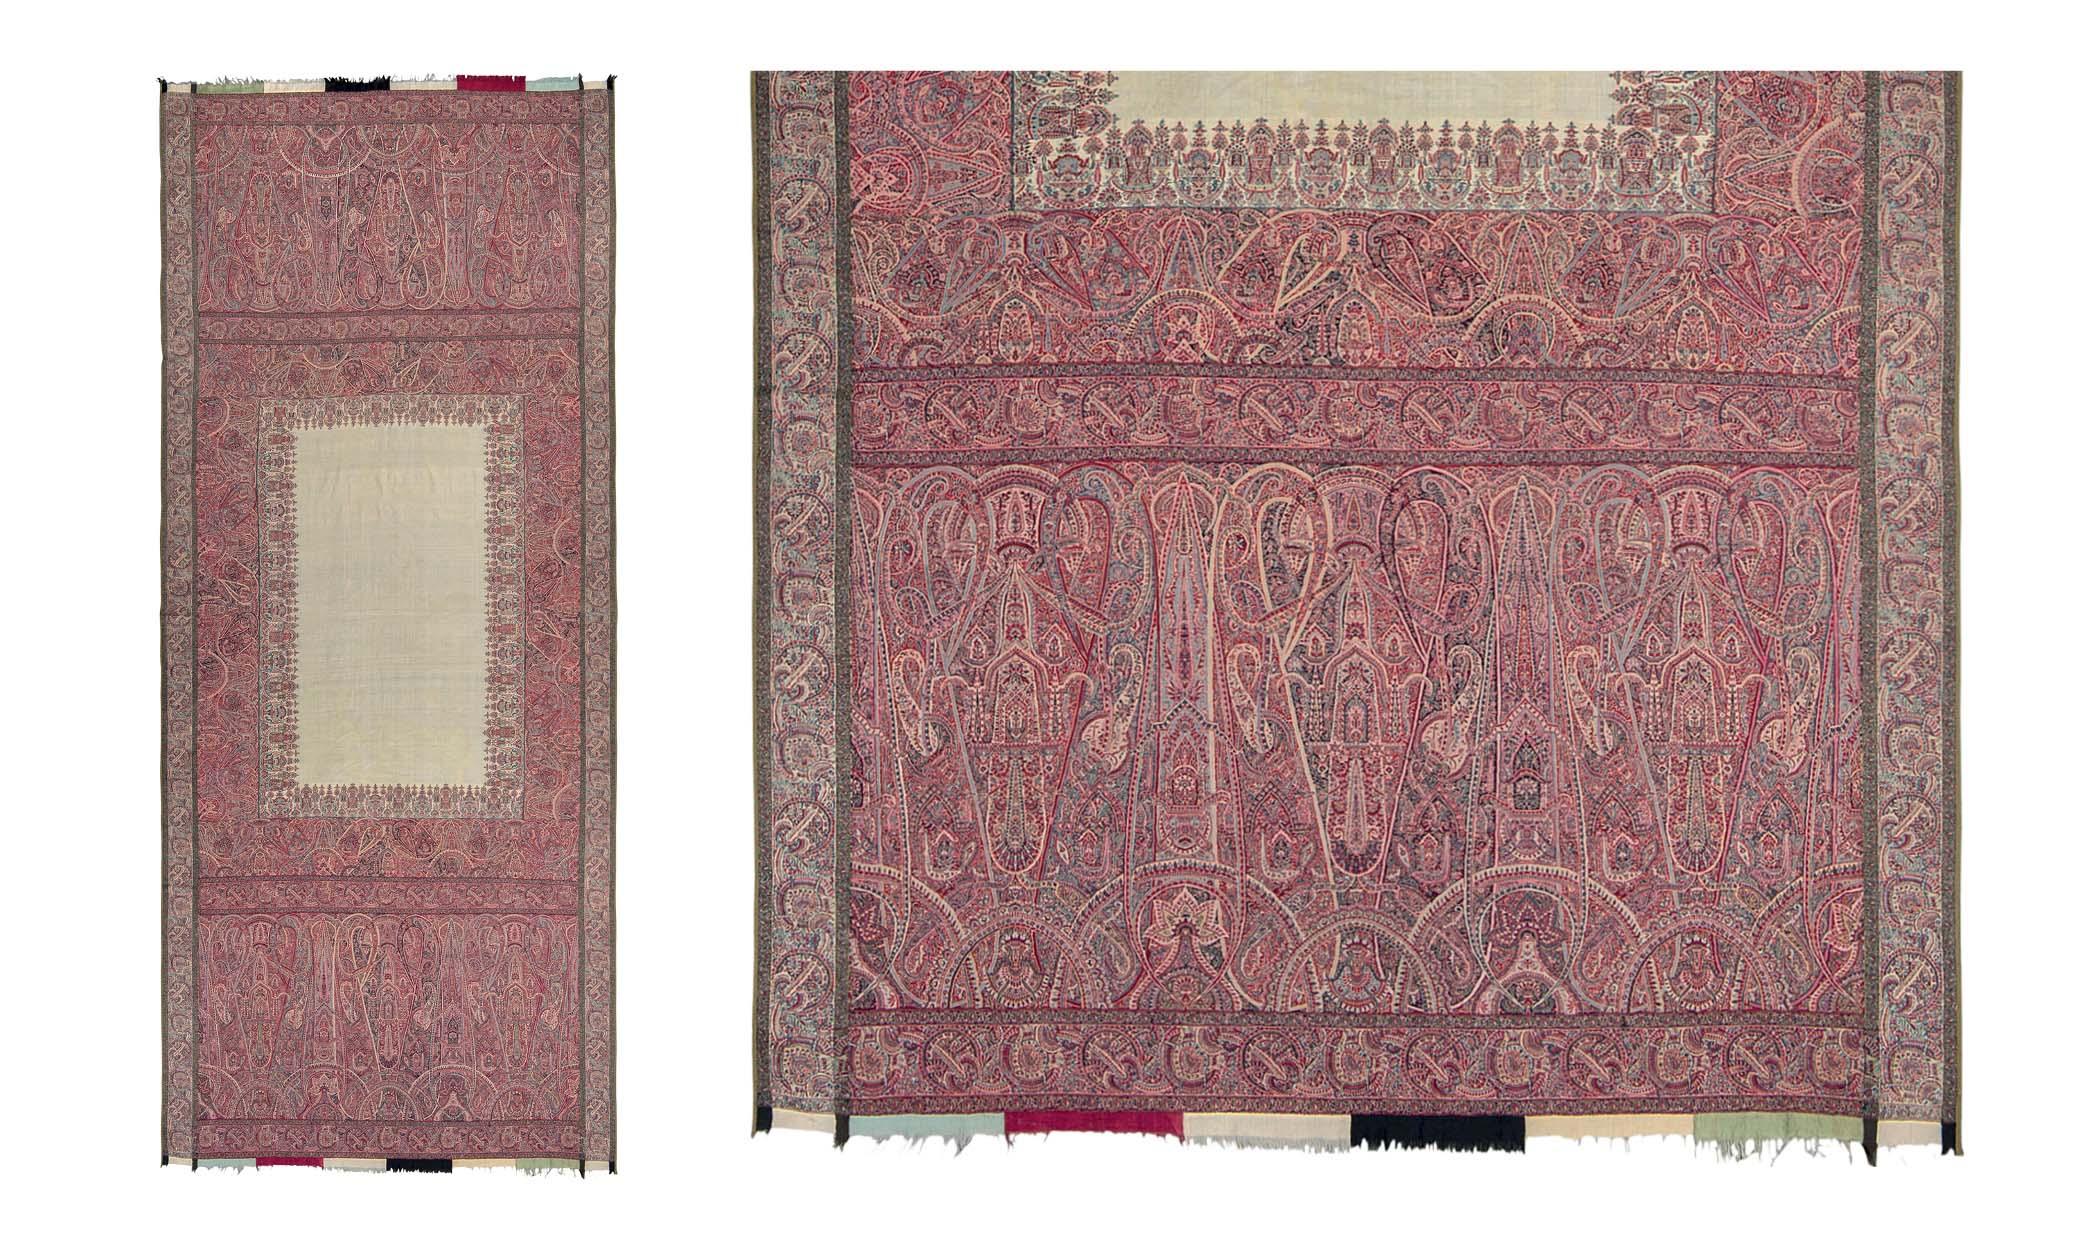 Lot 2: LONG SHAWL (DOCHALLA). NORTH INDIA, CIRCA 1840.